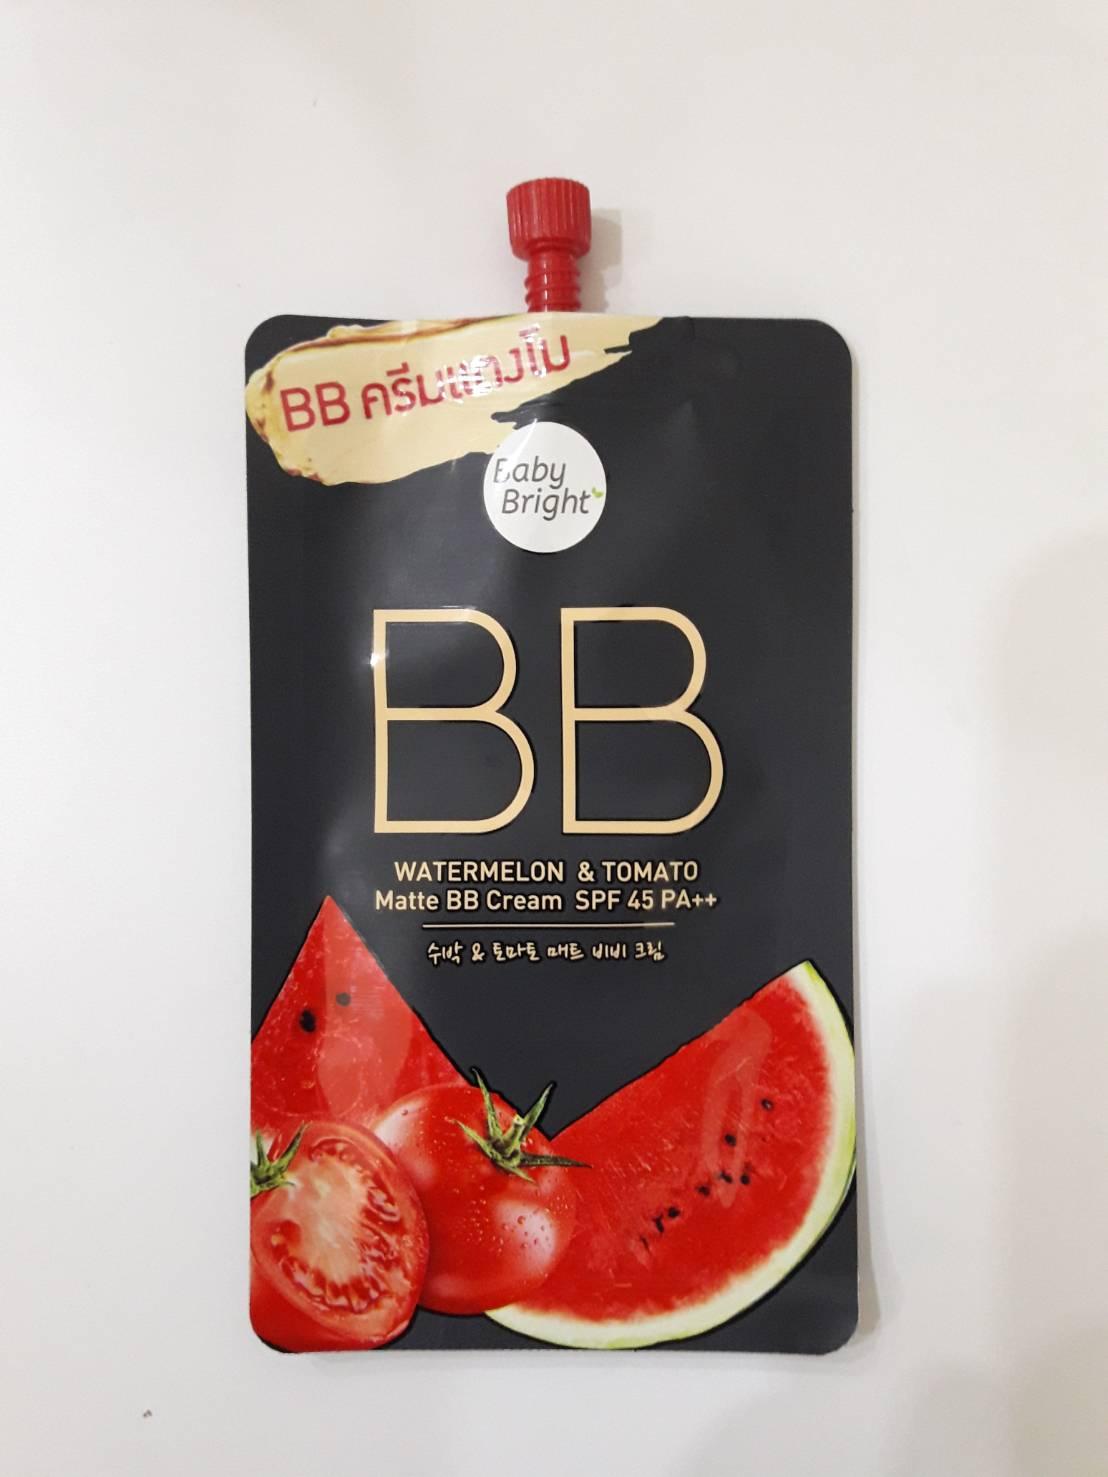 BBวอเตอร์เมล่อน  โทเมโทบีบีครีม WatermelonTomato Matte BB Cream.(7g)